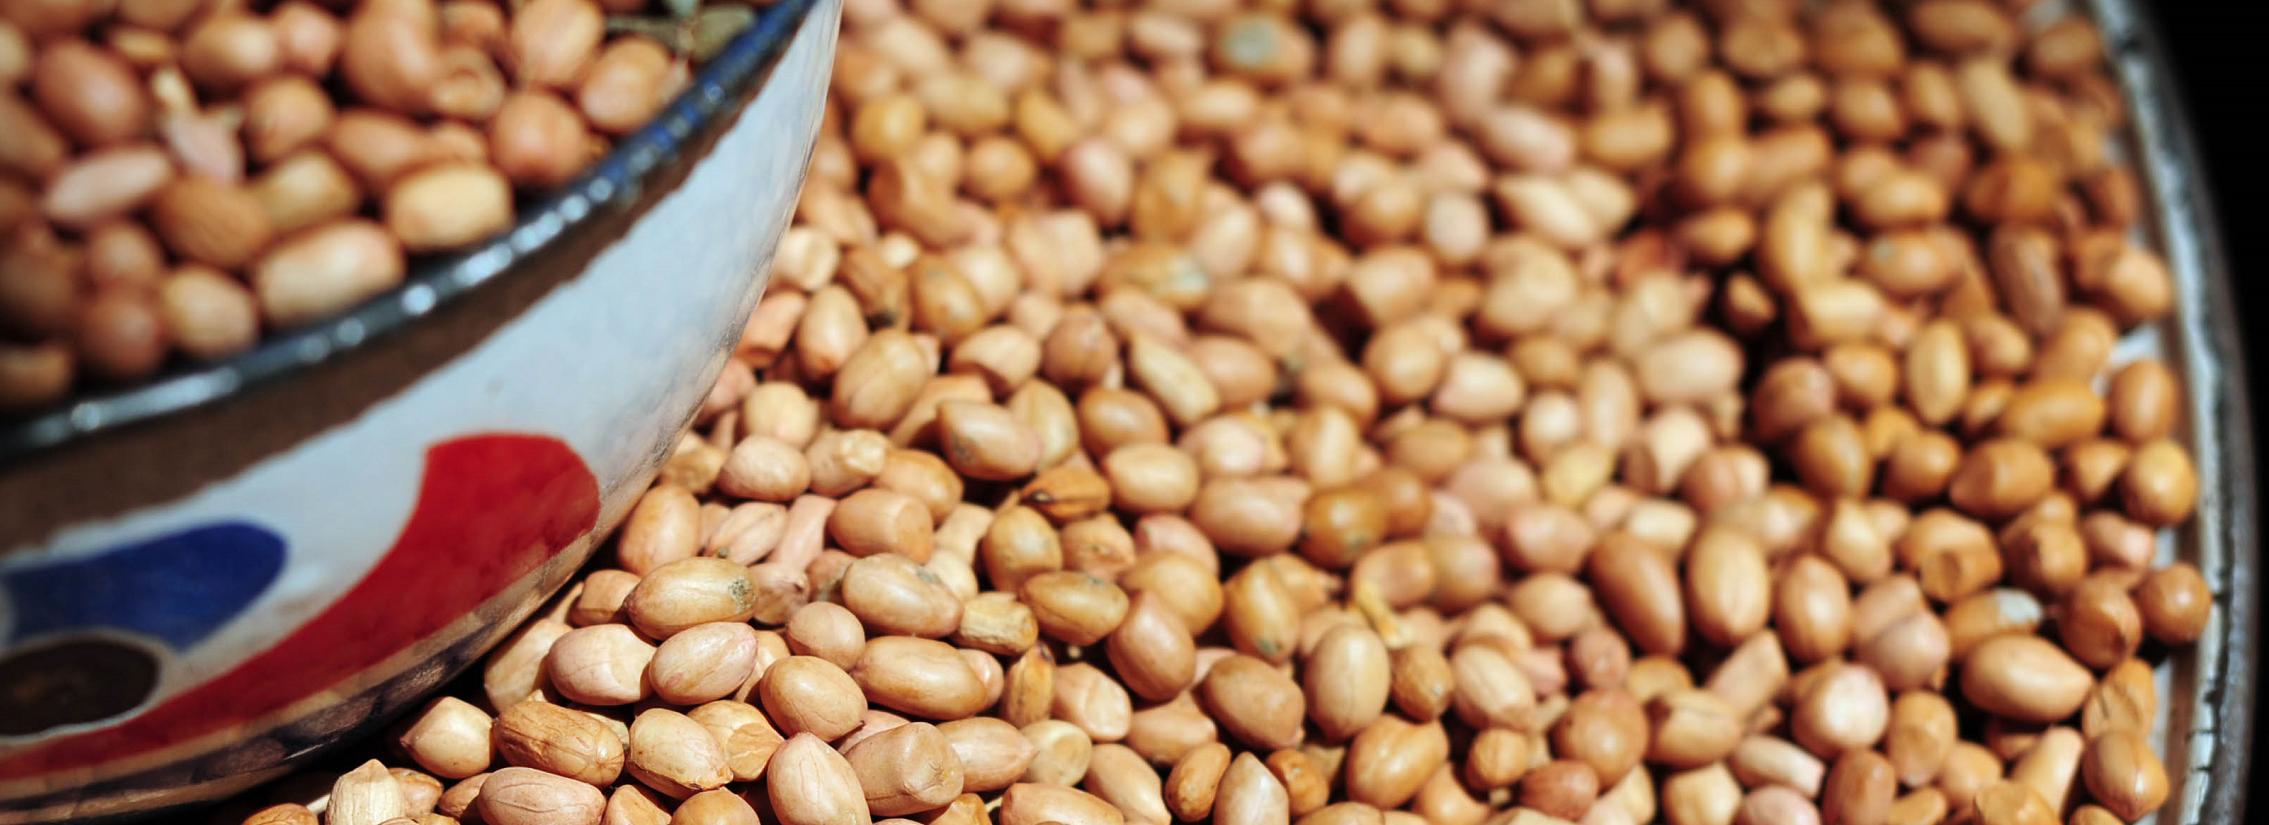 Upscaling improved groundnut varieties - Ghana & Mali